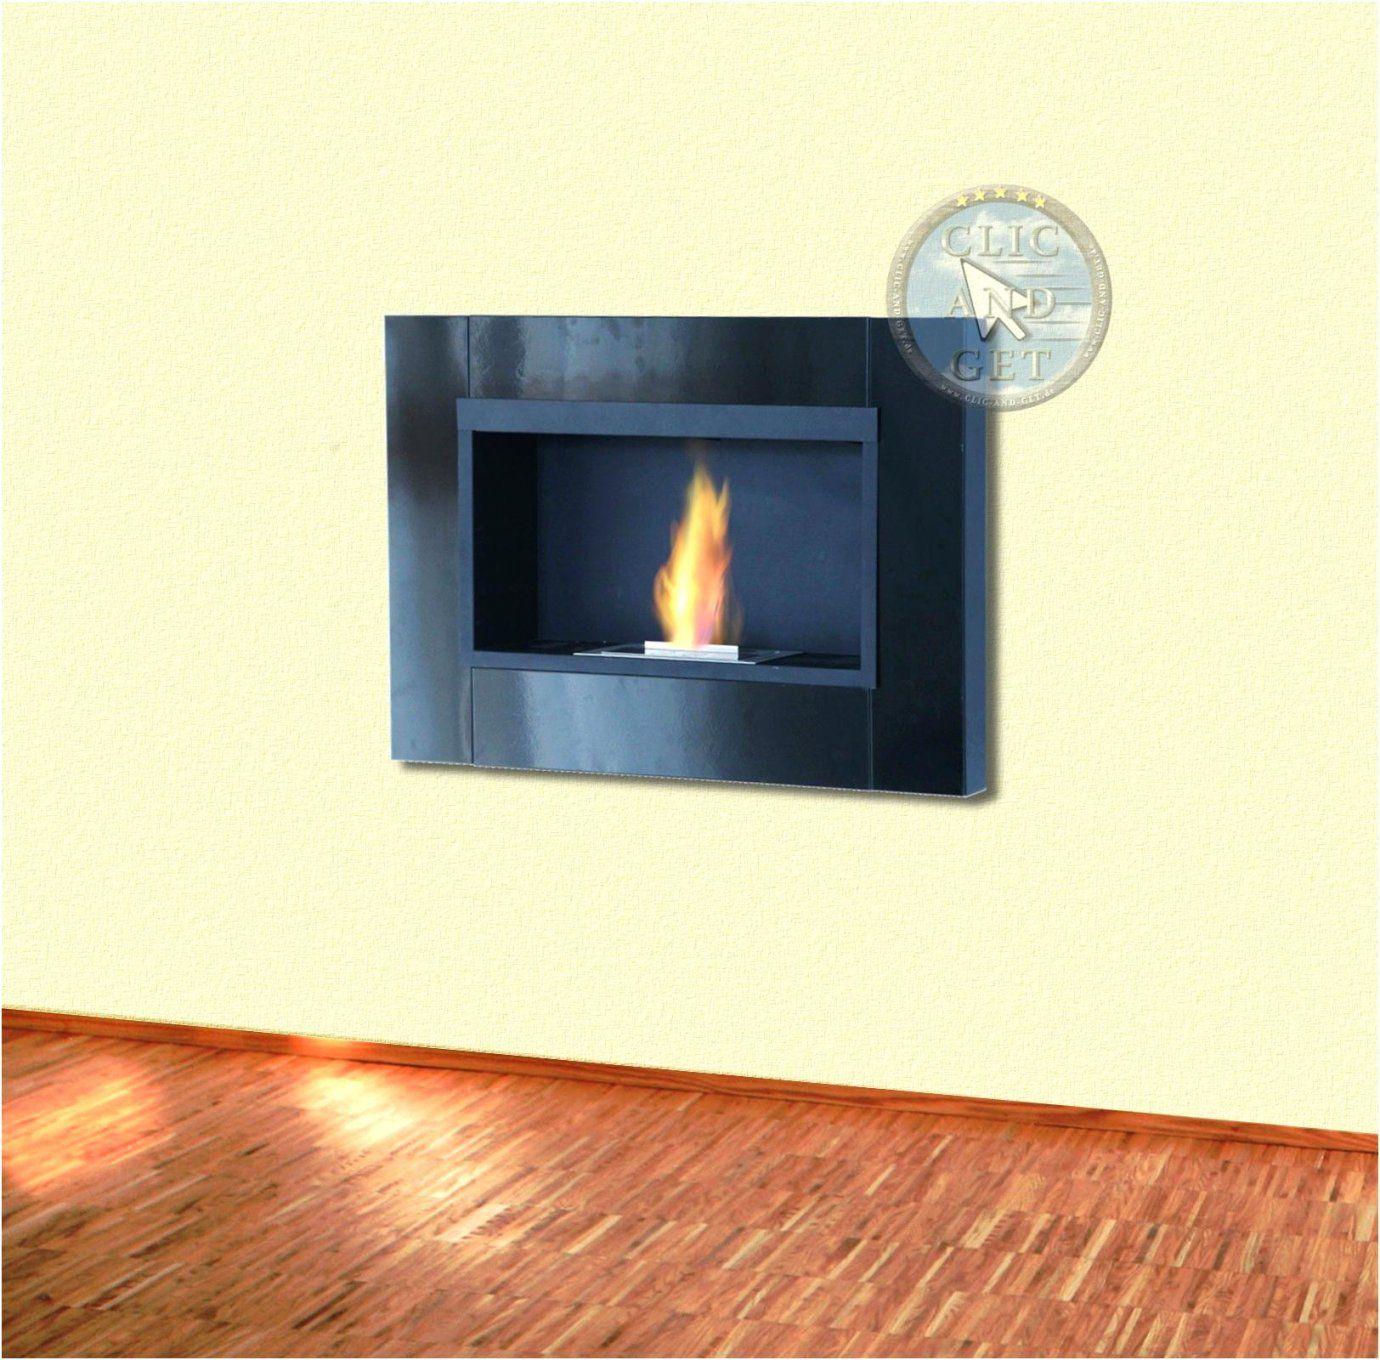 ethanol brenner selber bauen haus design ideen. Black Bedroom Furniture Sets. Home Design Ideas